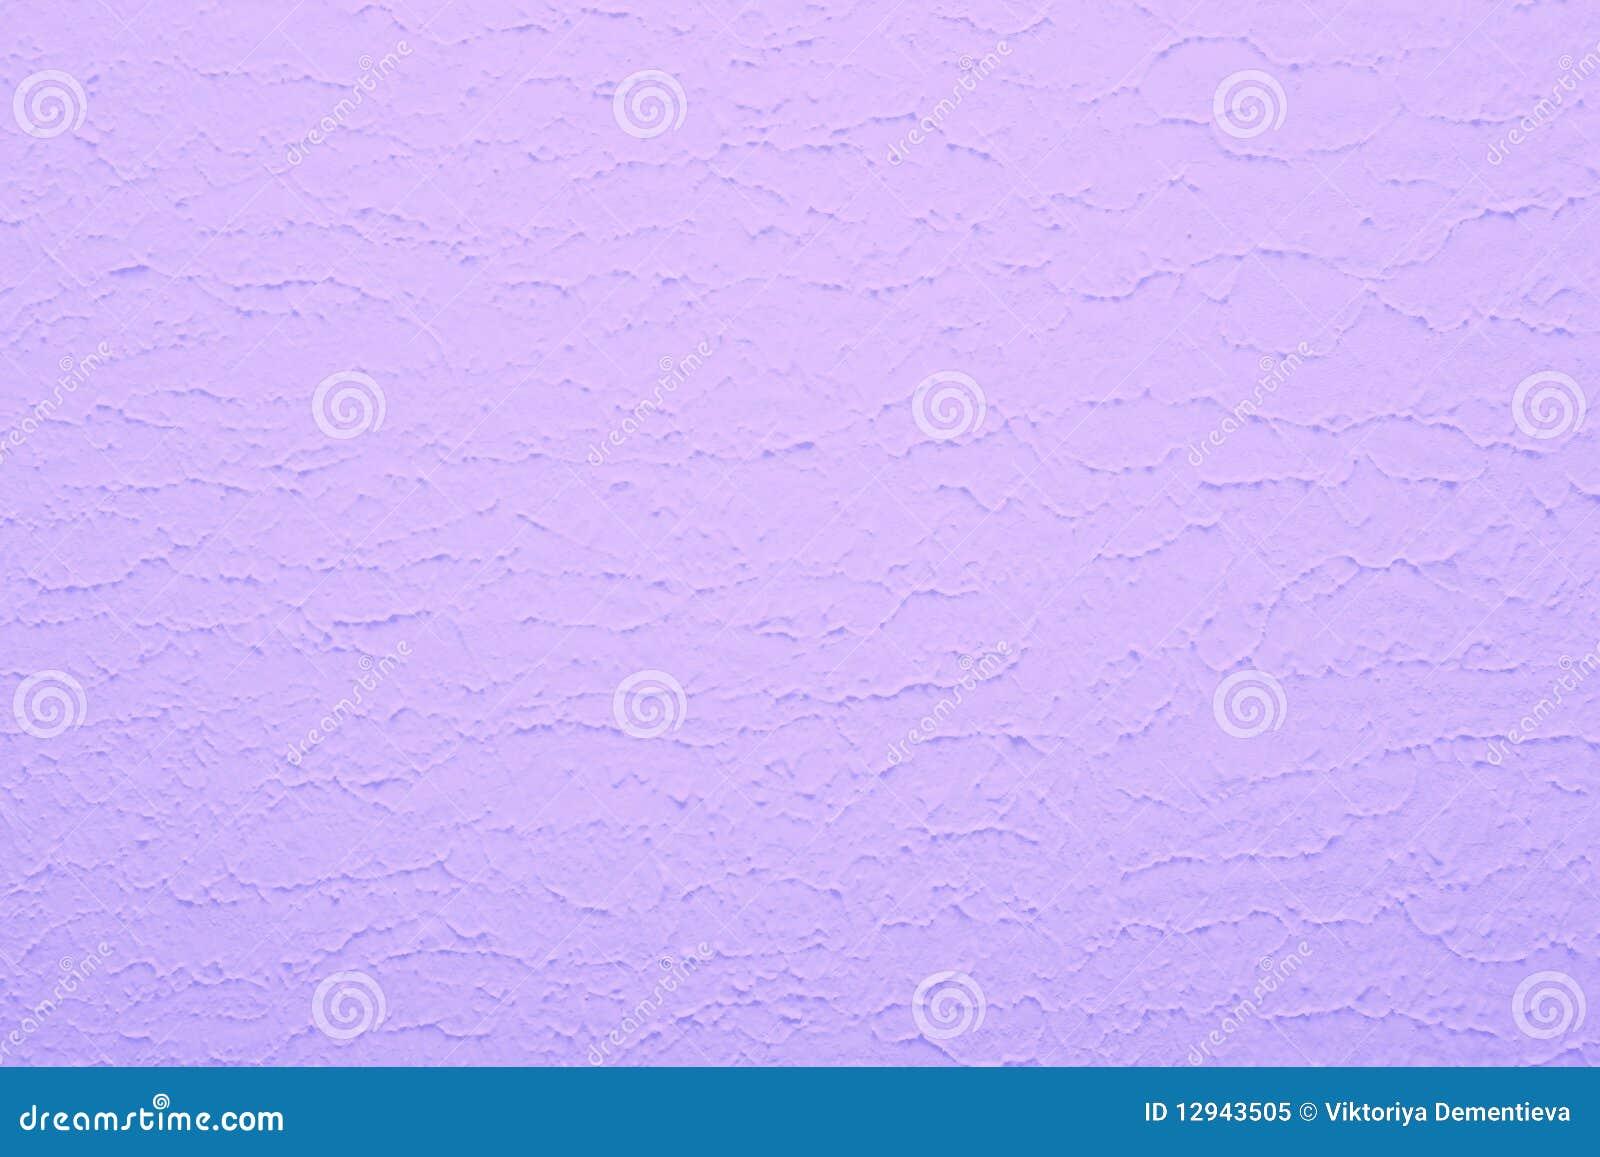 lila wand lizenzfreies stockfoto bild 12943505. Black Bedroom Furniture Sets. Home Design Ideas